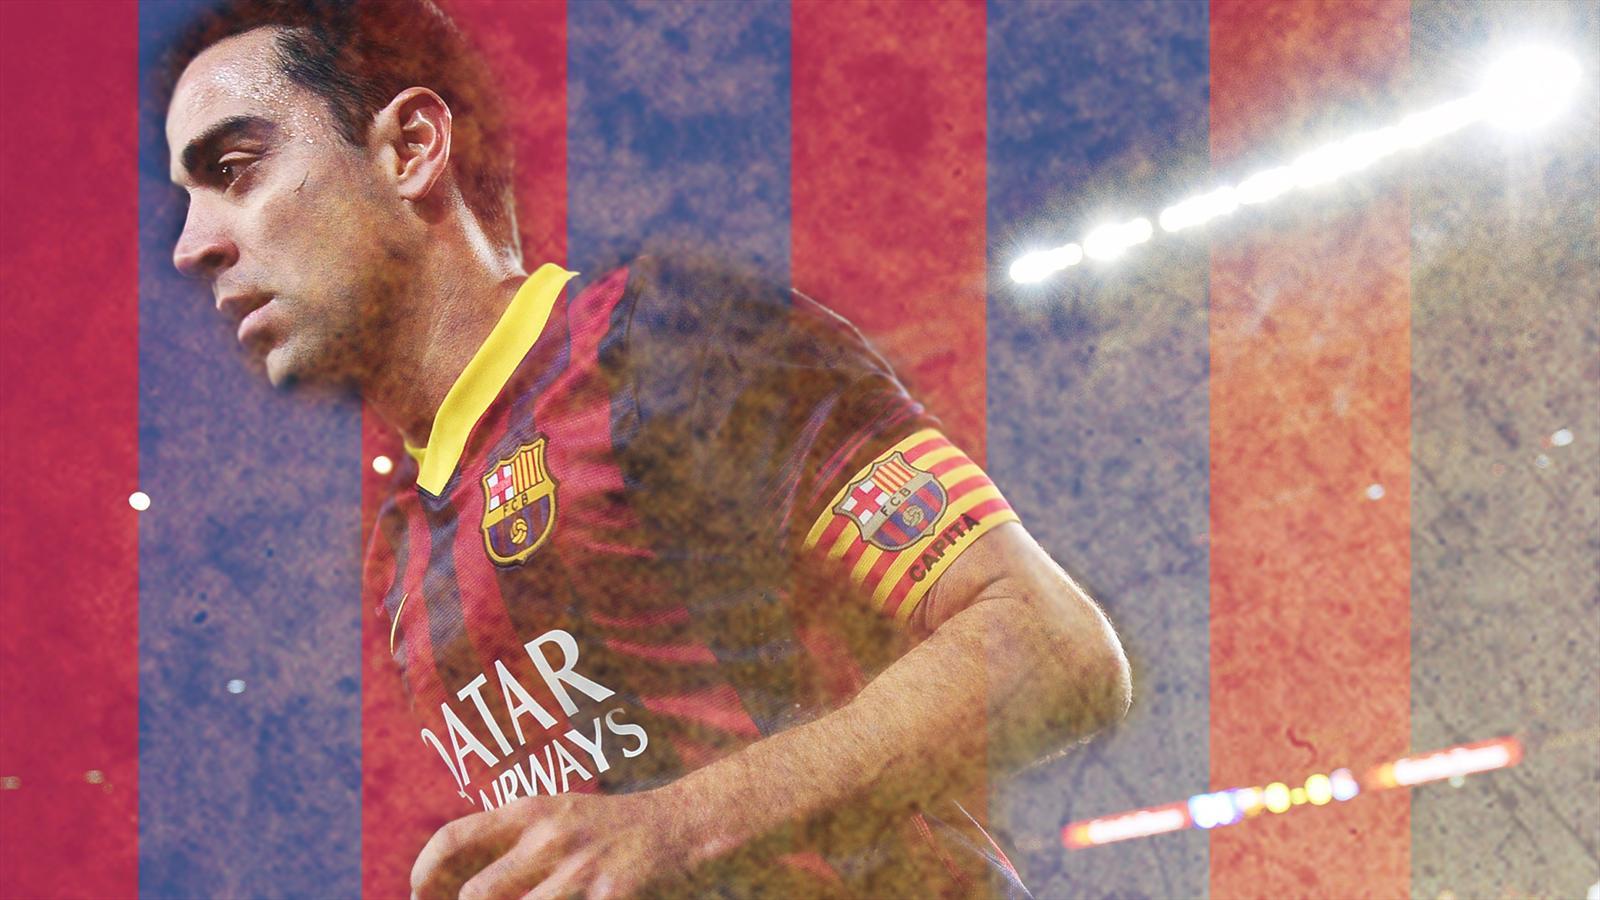 Report: PSG to loan Barcelona legend Xavi from Al-Sadd - Ligue 1 2011-2012 - Football - Eurosport